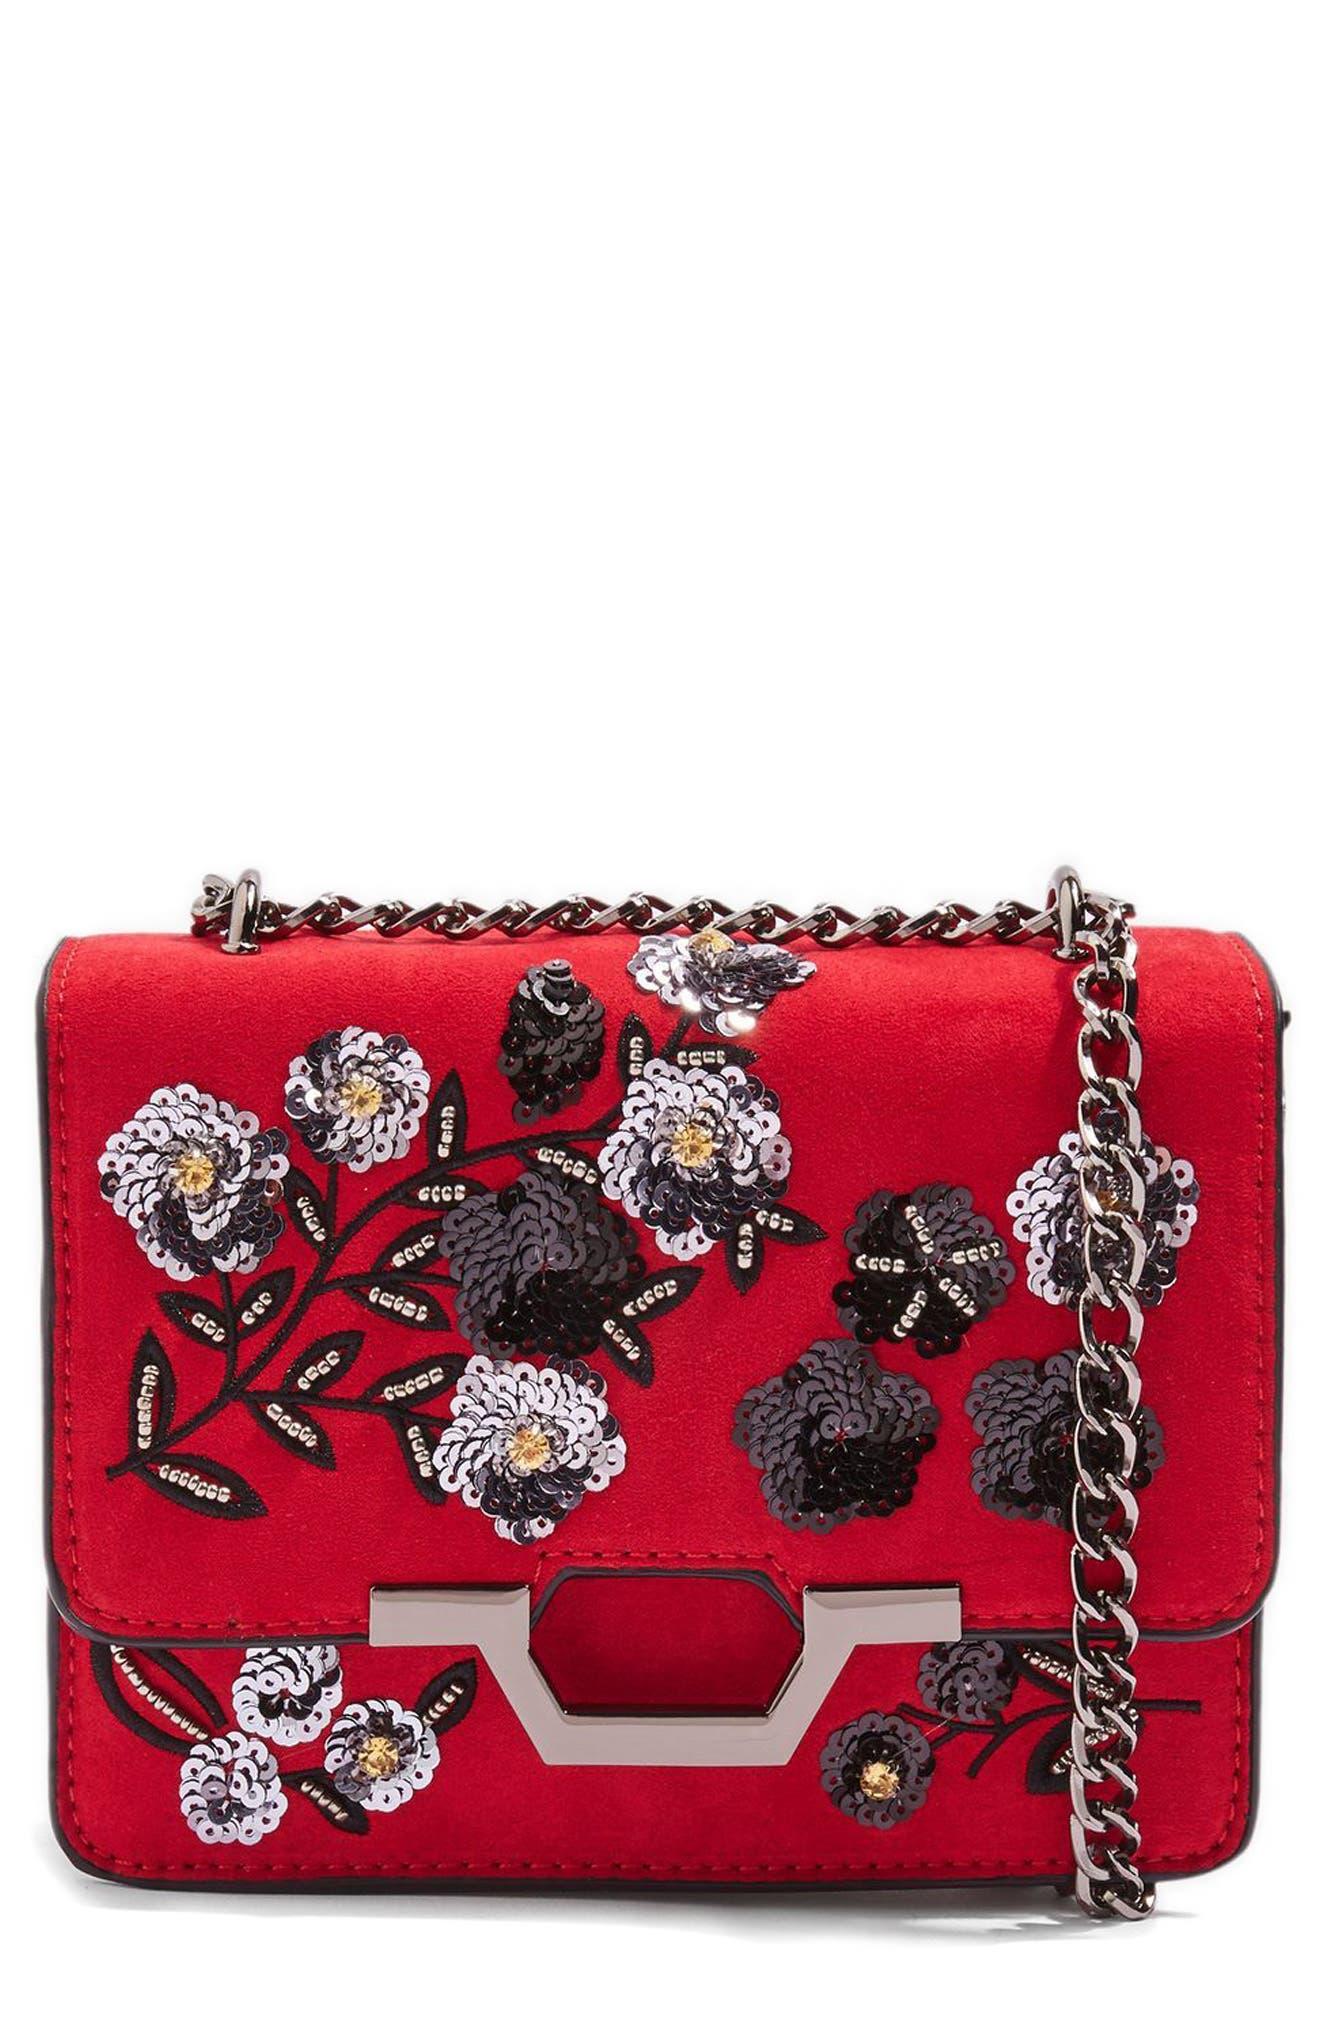 Topshop Kylie Embellished Faux Suede Crossbody Bag